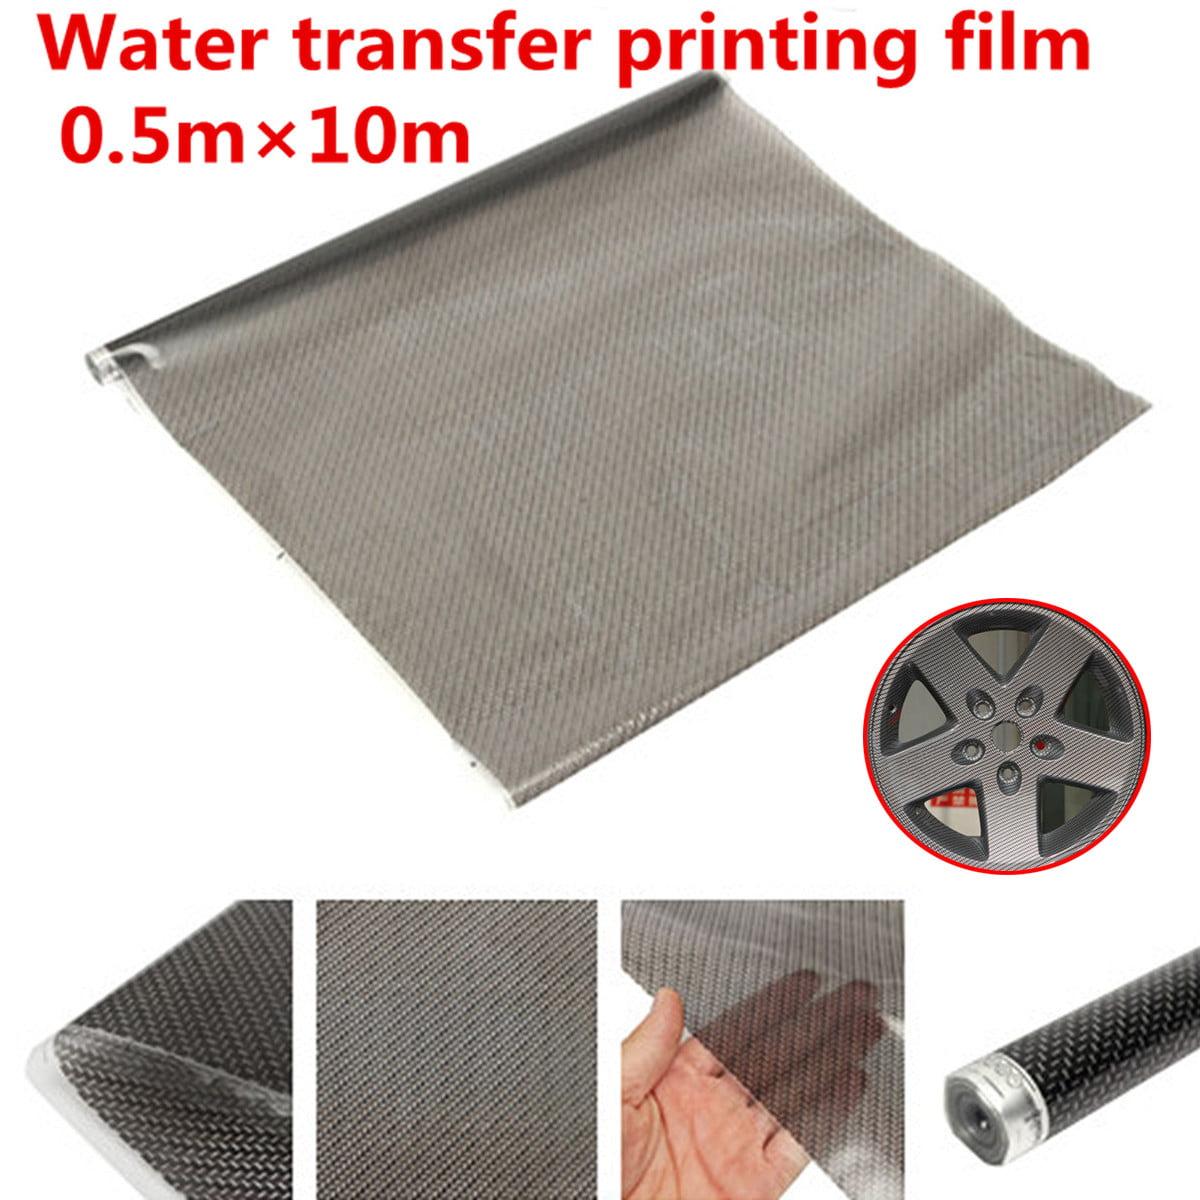 05m X 10m Black Pva Carbon Fiber Water Transfer Printing Film Hydrodipping